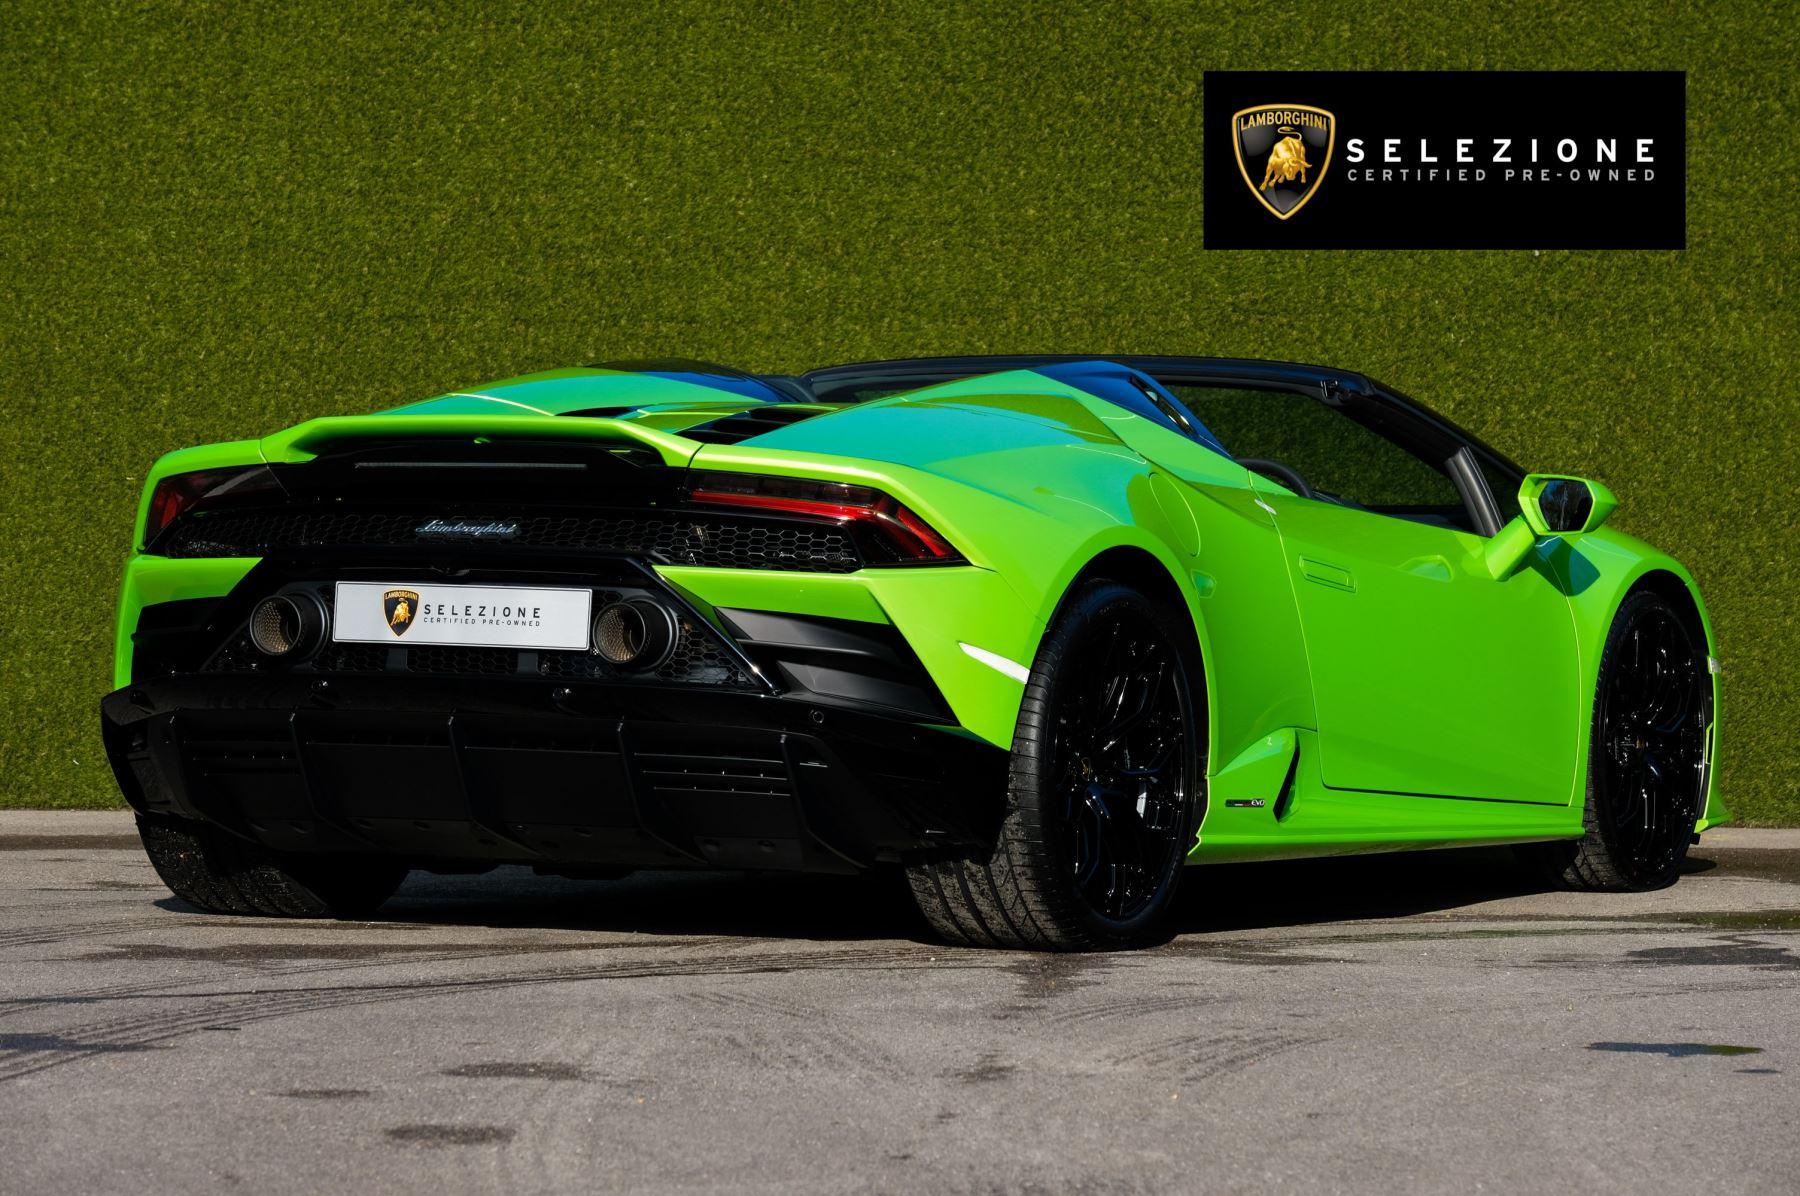 Lamborghini Huracan EVO Spyder 5.2 V10 610 2dr Auto image 3